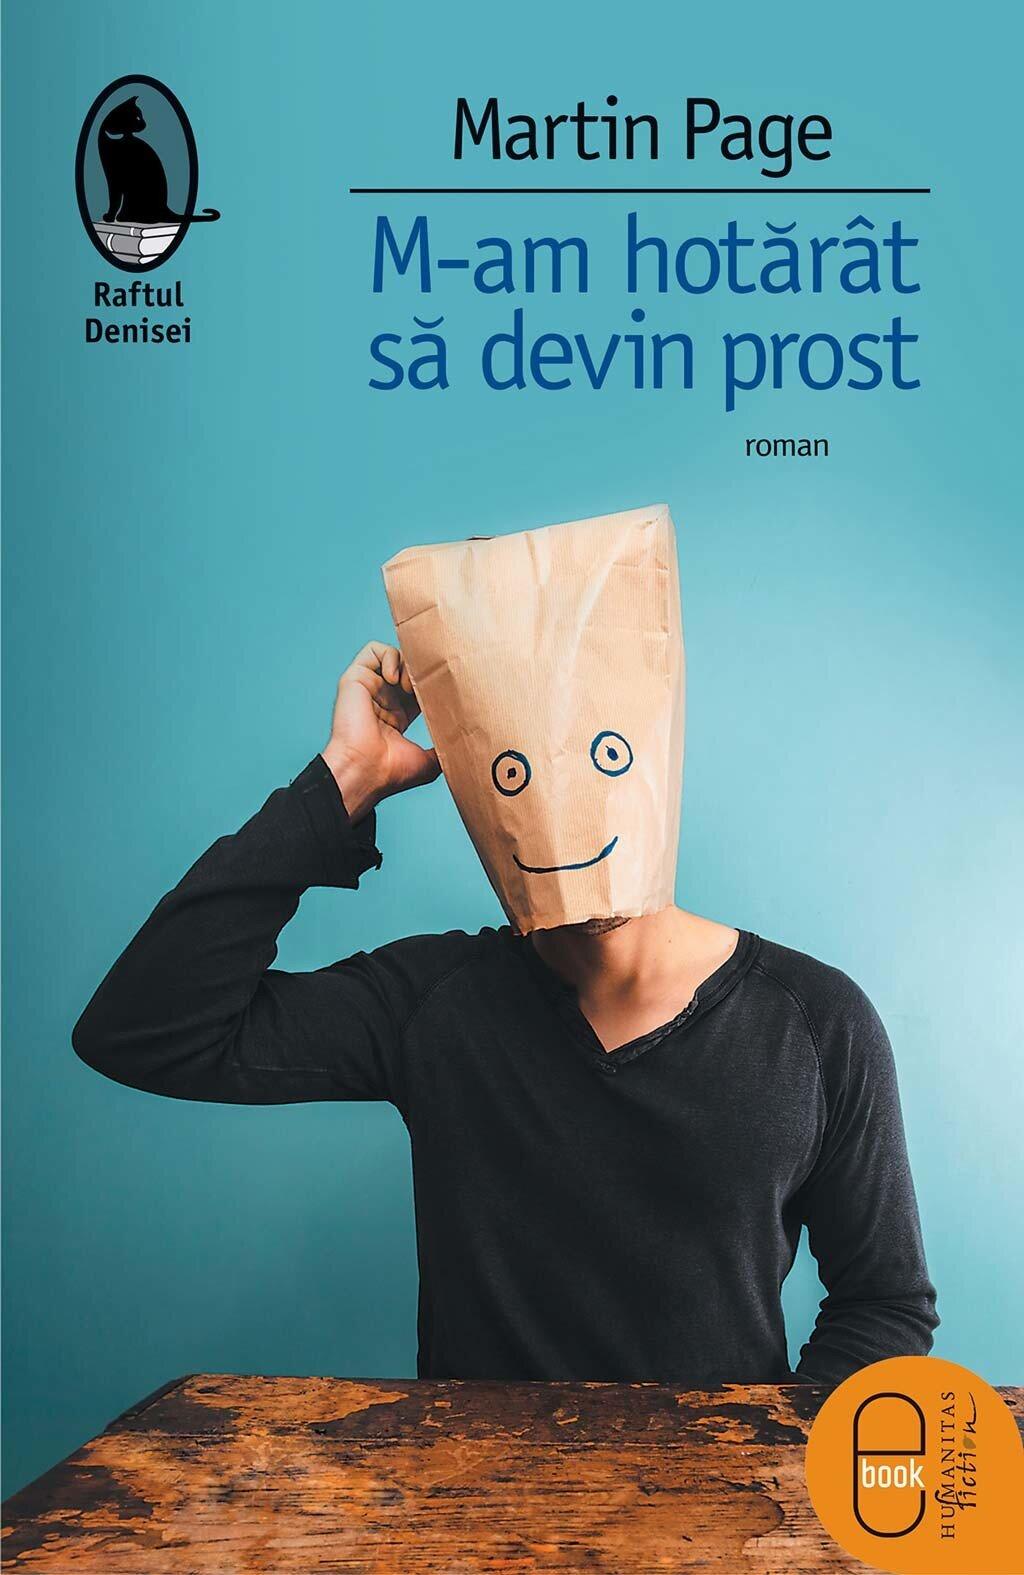 M-am hotarat sa devin prost PDF (Download eBook)